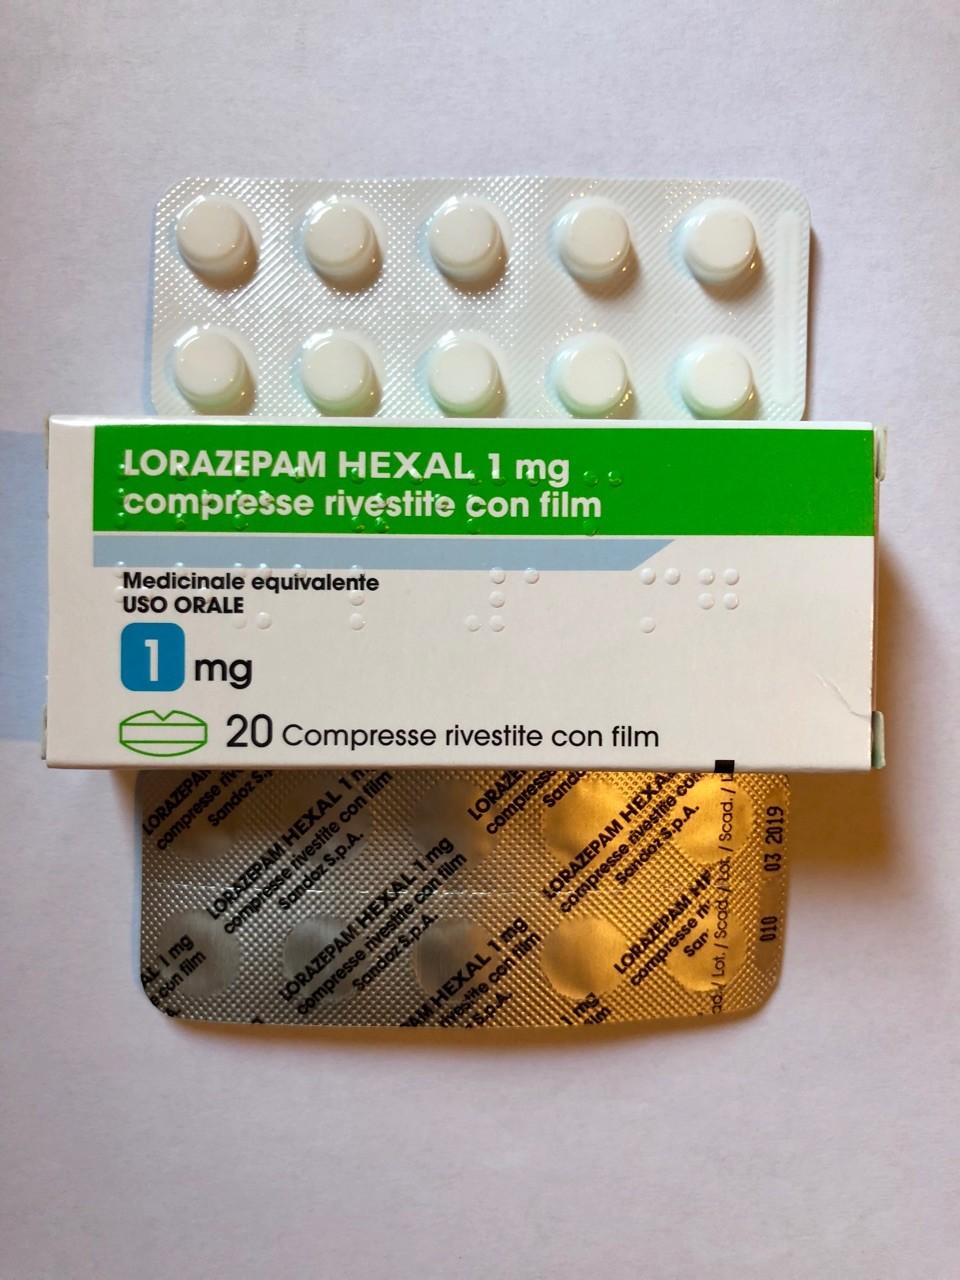 Lorazepam Hexal 1mg Brand